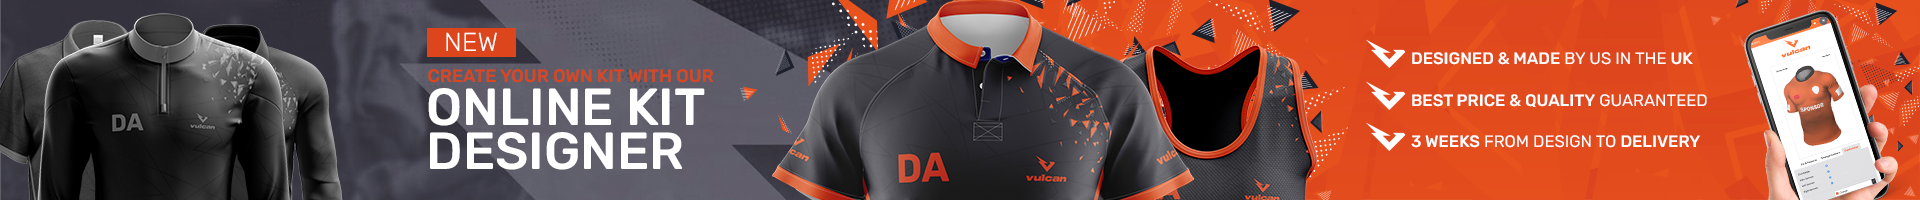 vulcan-sports-kit-builder-1900x200px